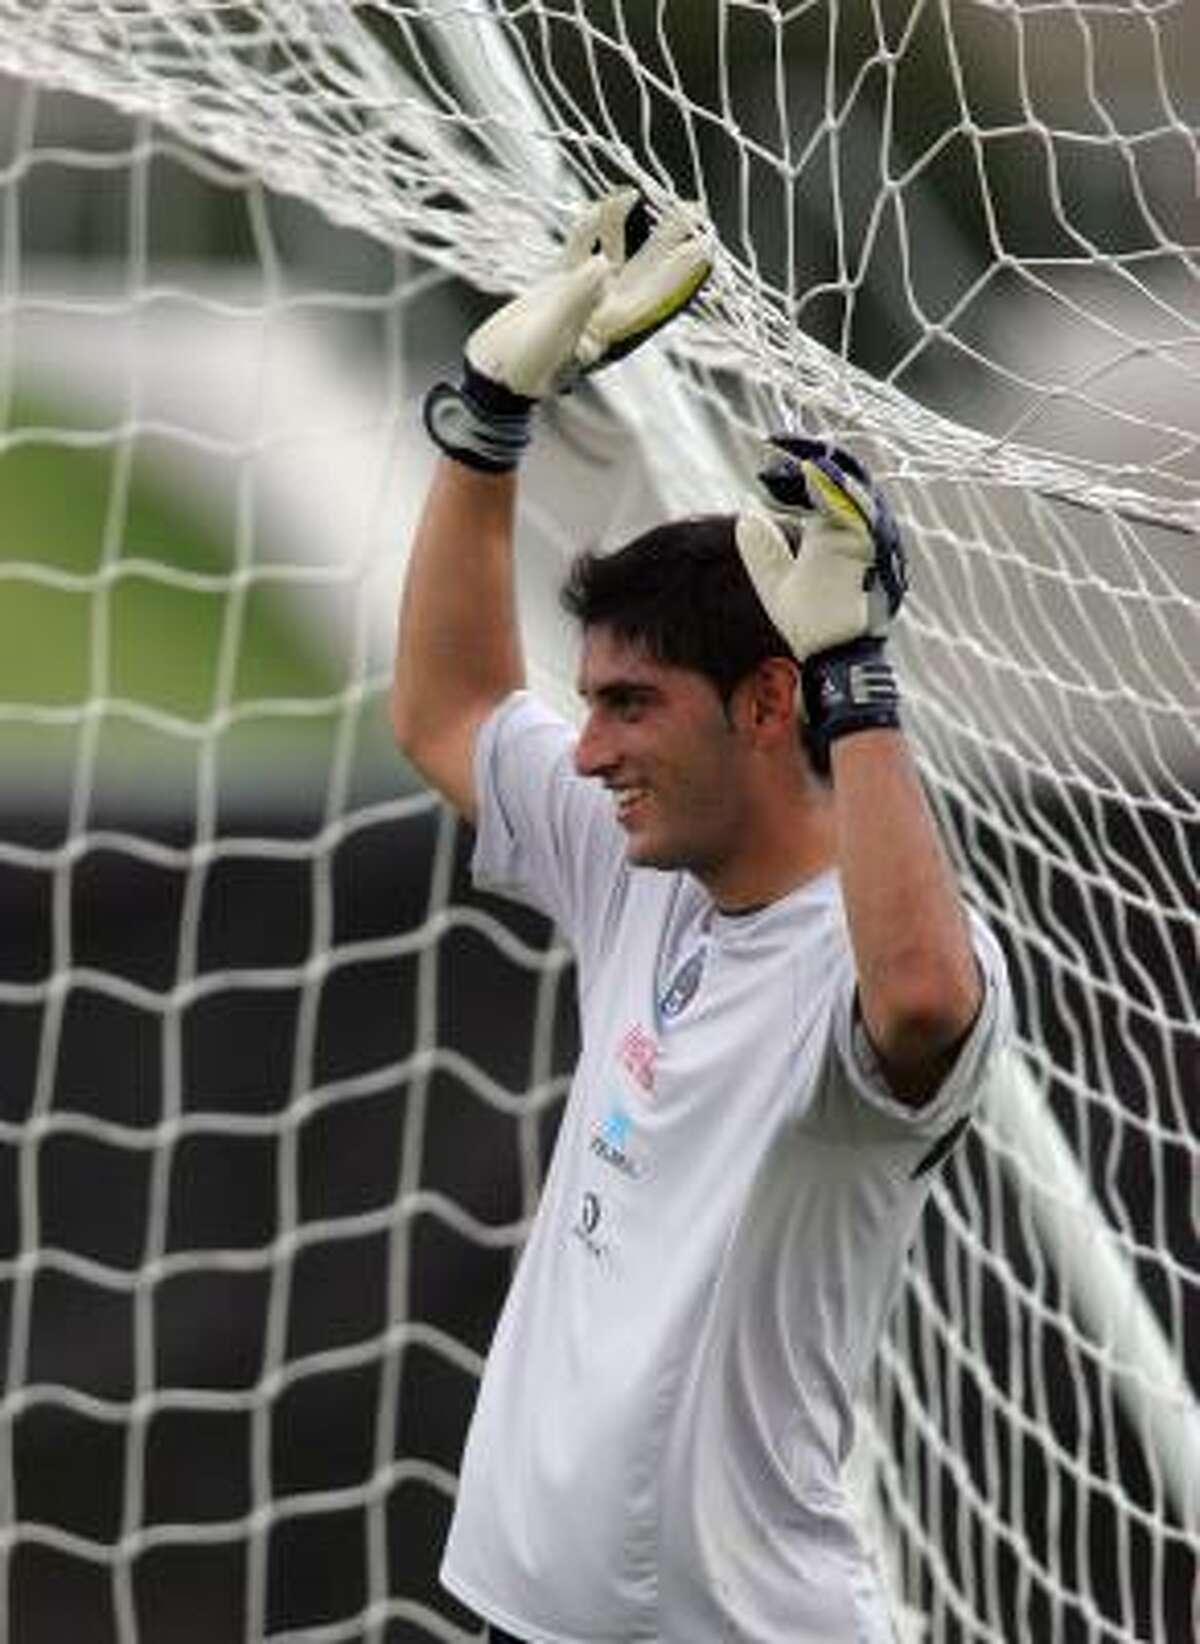 Goalkeeper: Jose de Jesus Corona Club: Tecos